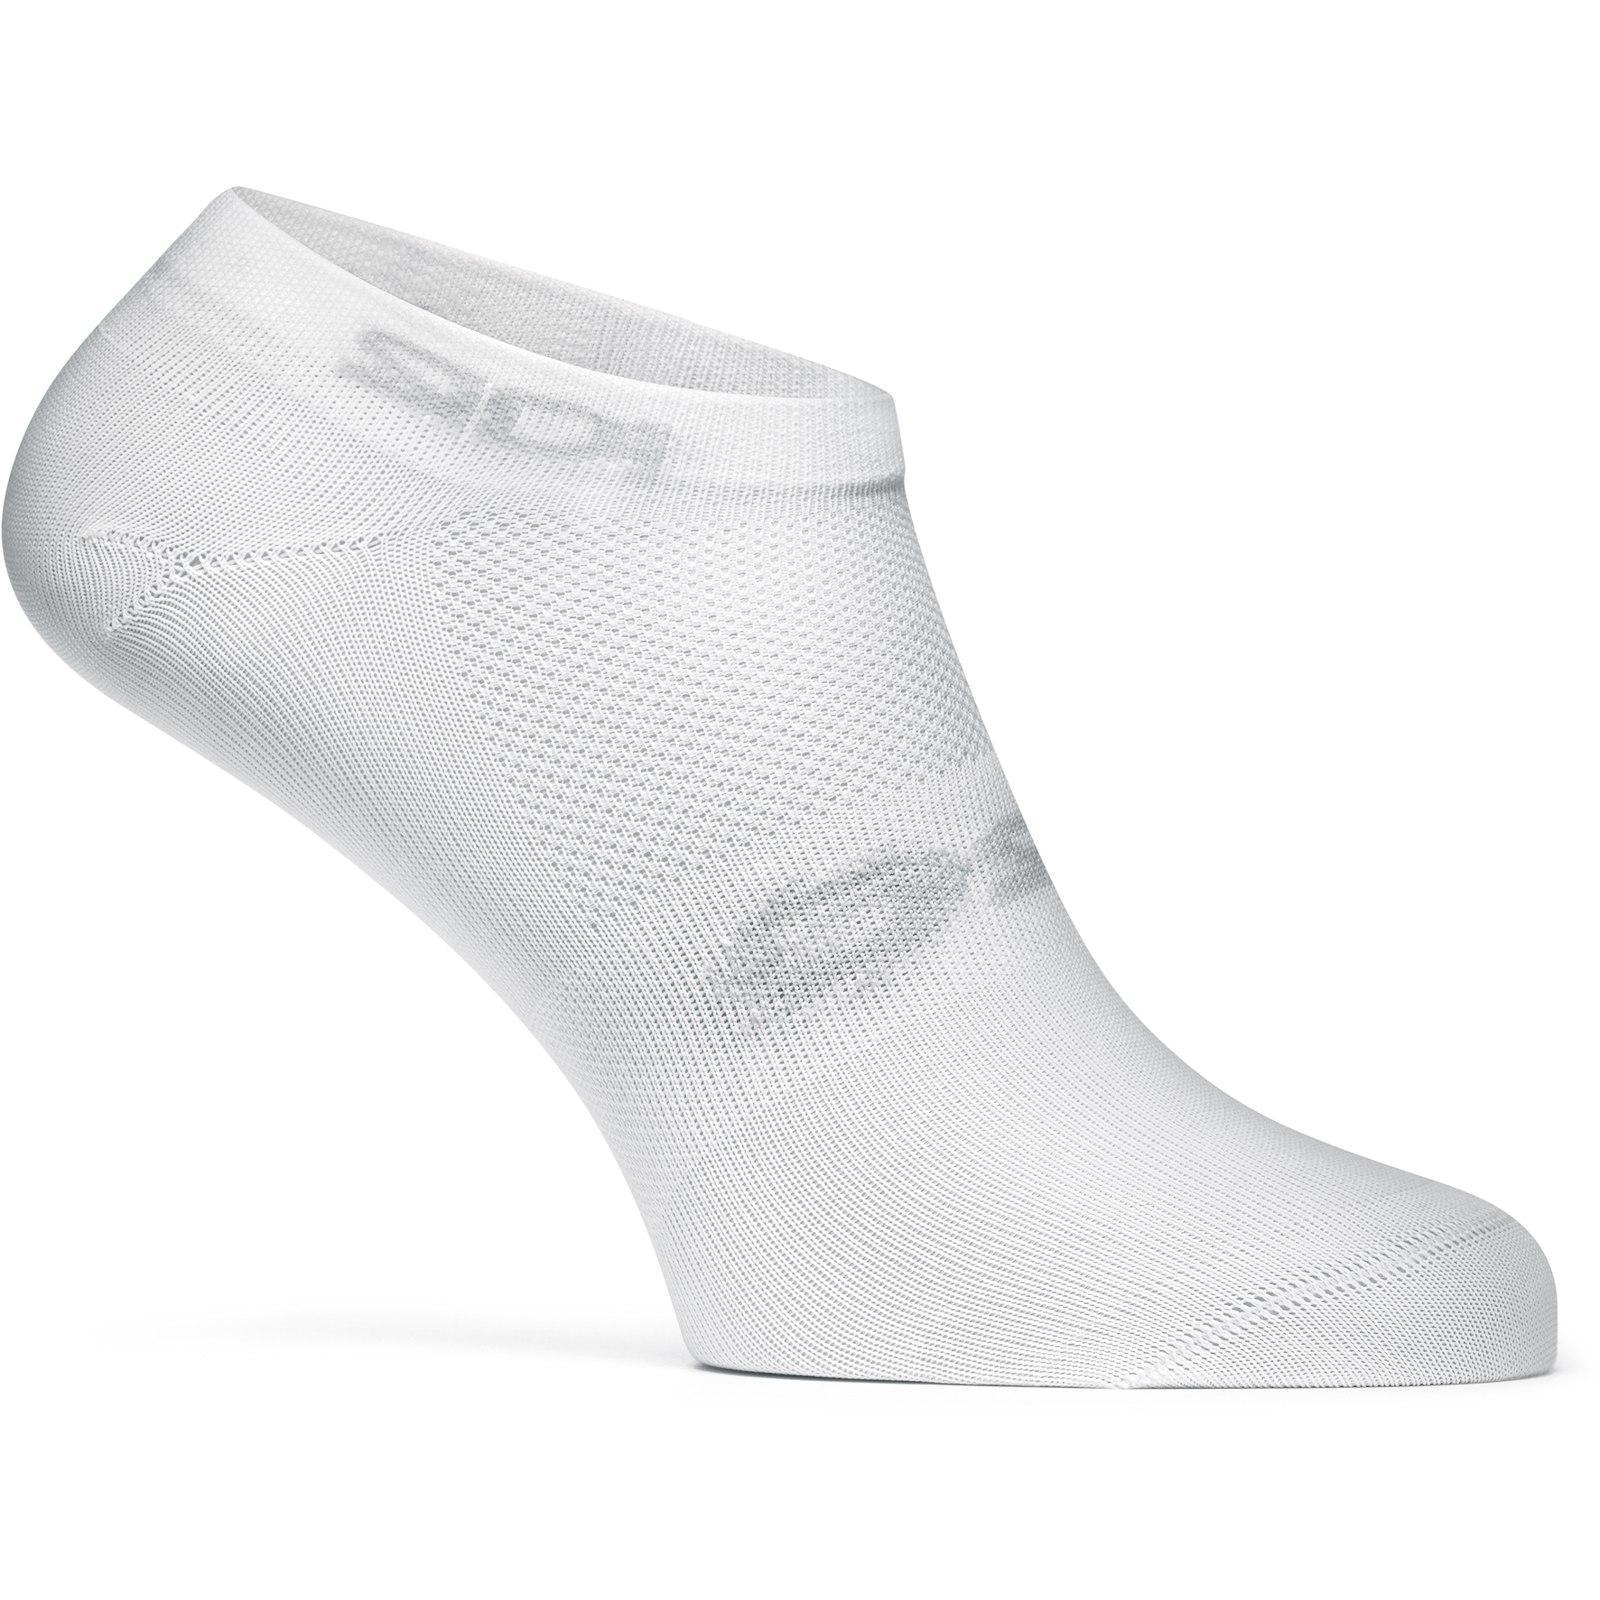 Sidi Ghost Coolmax Socks - white/grey